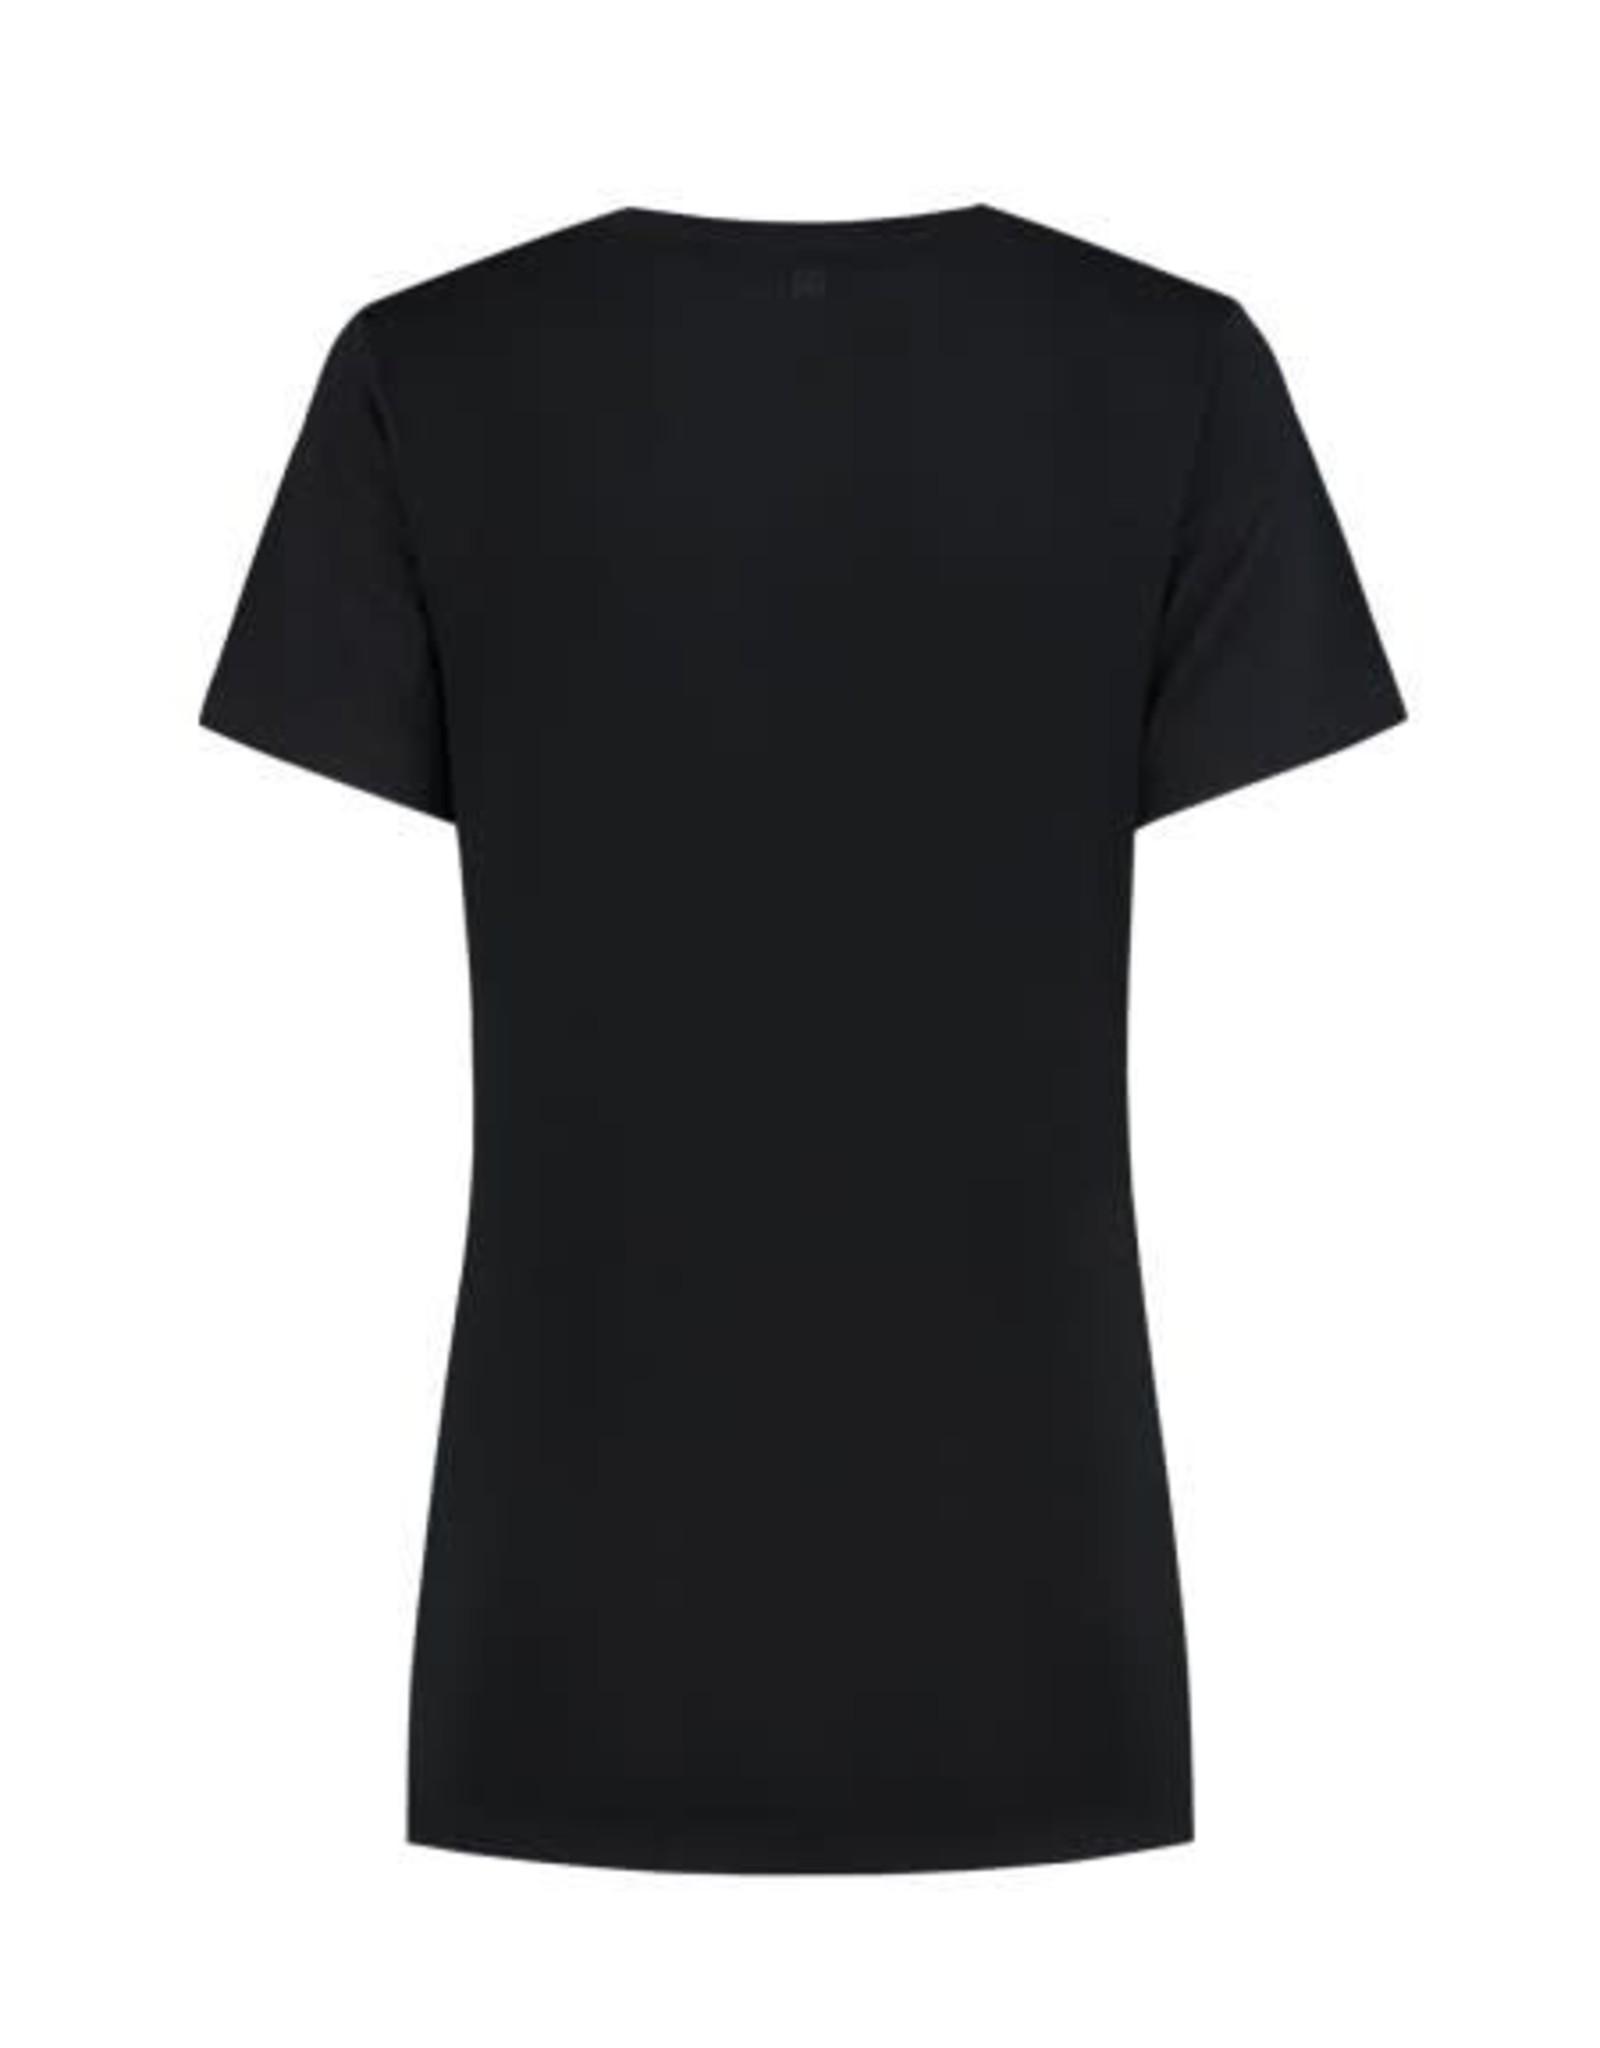 Nikkie Nikkie Logo T-Shirt